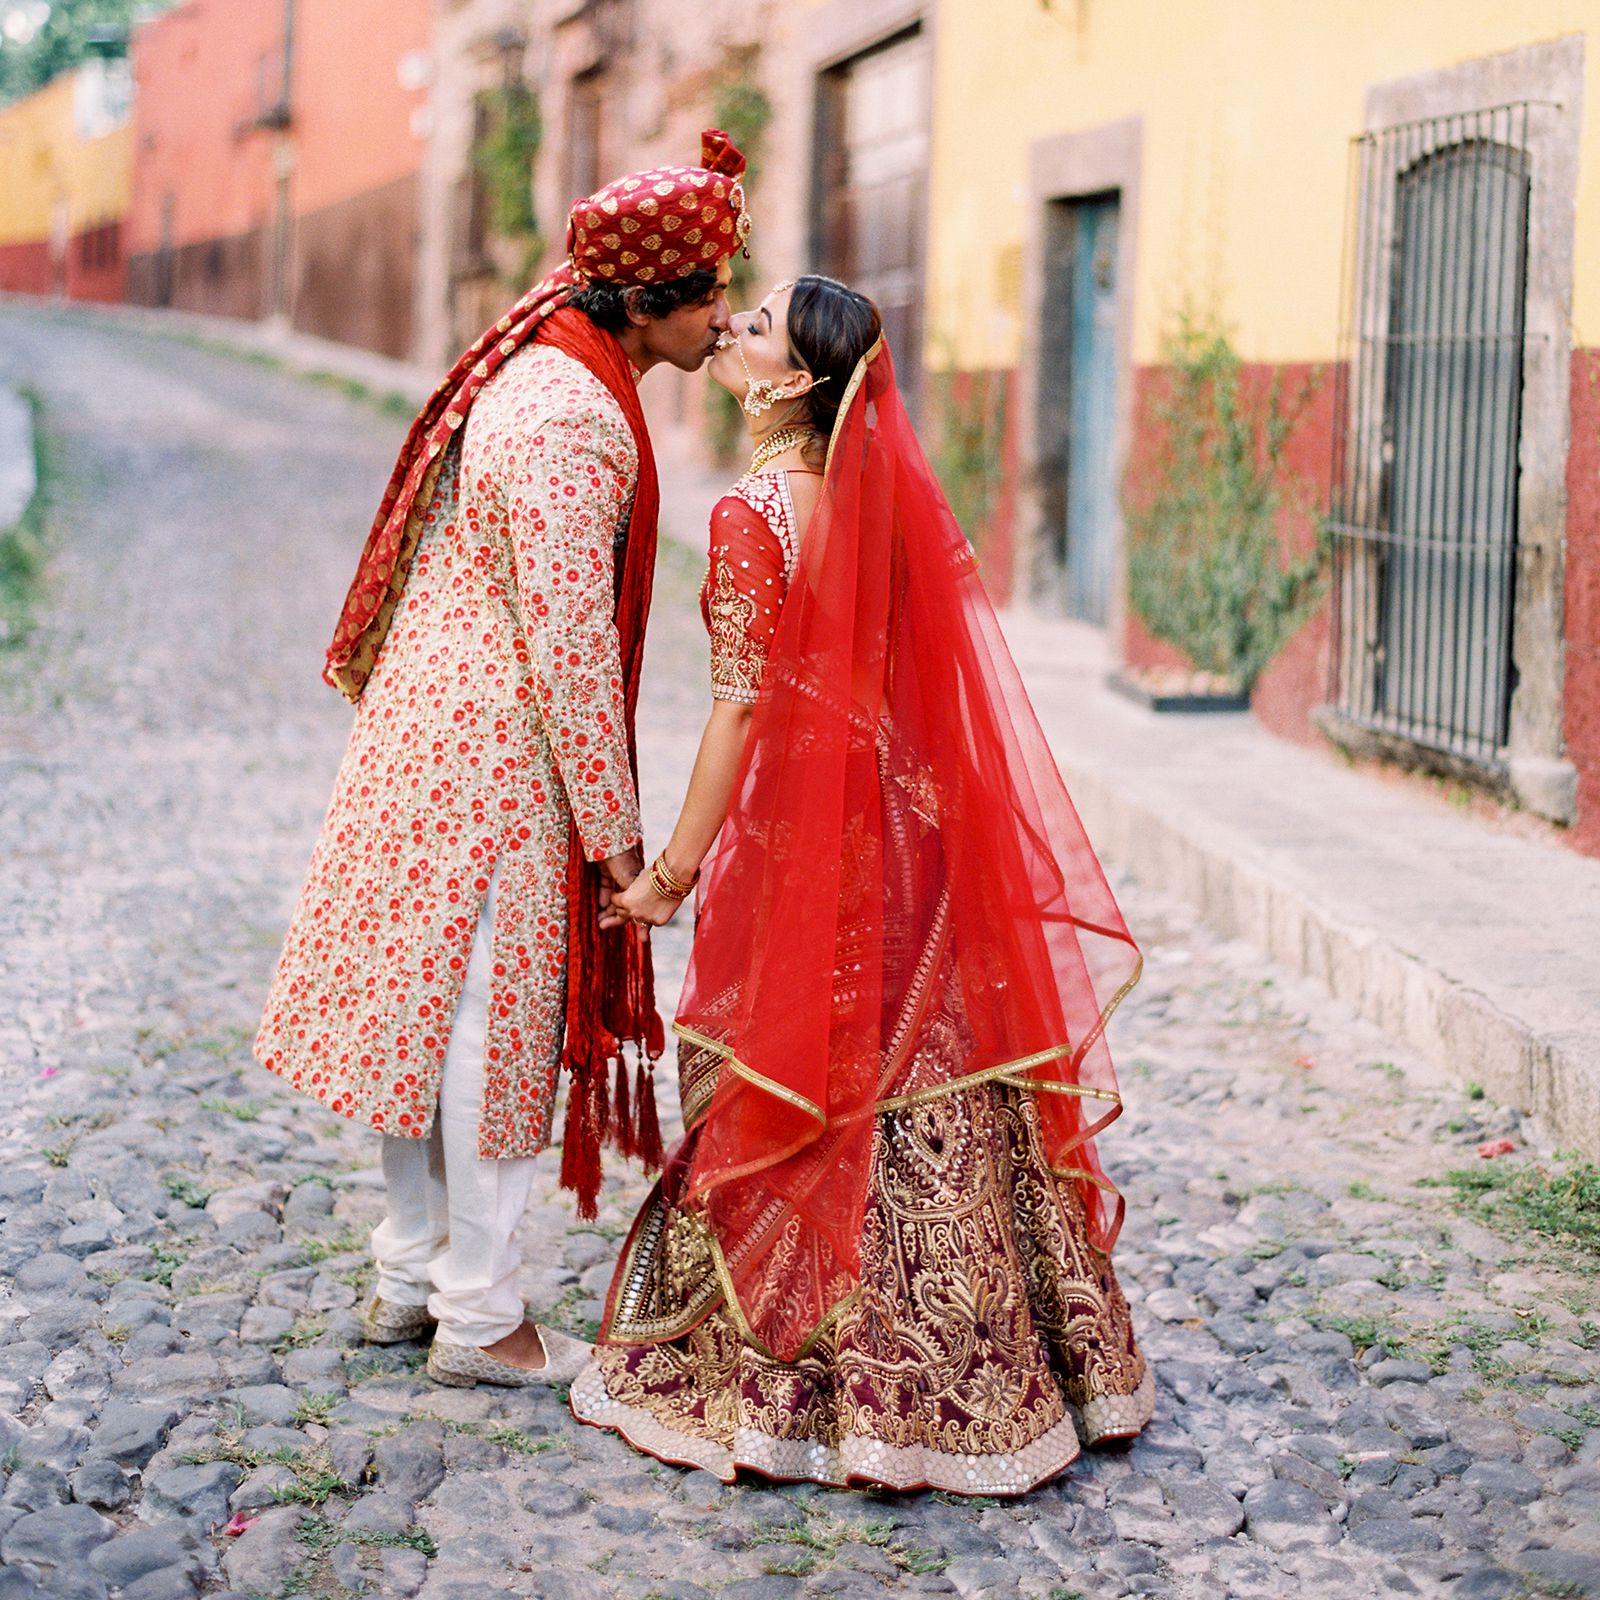 https://www.brides.com/thmb/Uv196ZPnn1jRs8sm-cWDmRVjbaY=/1600x1600/filters:fill(auto,1)/dulce-and-nashant-wedding_01-5e6e0ffe06b242a7ab3714c4b494d550.jpg